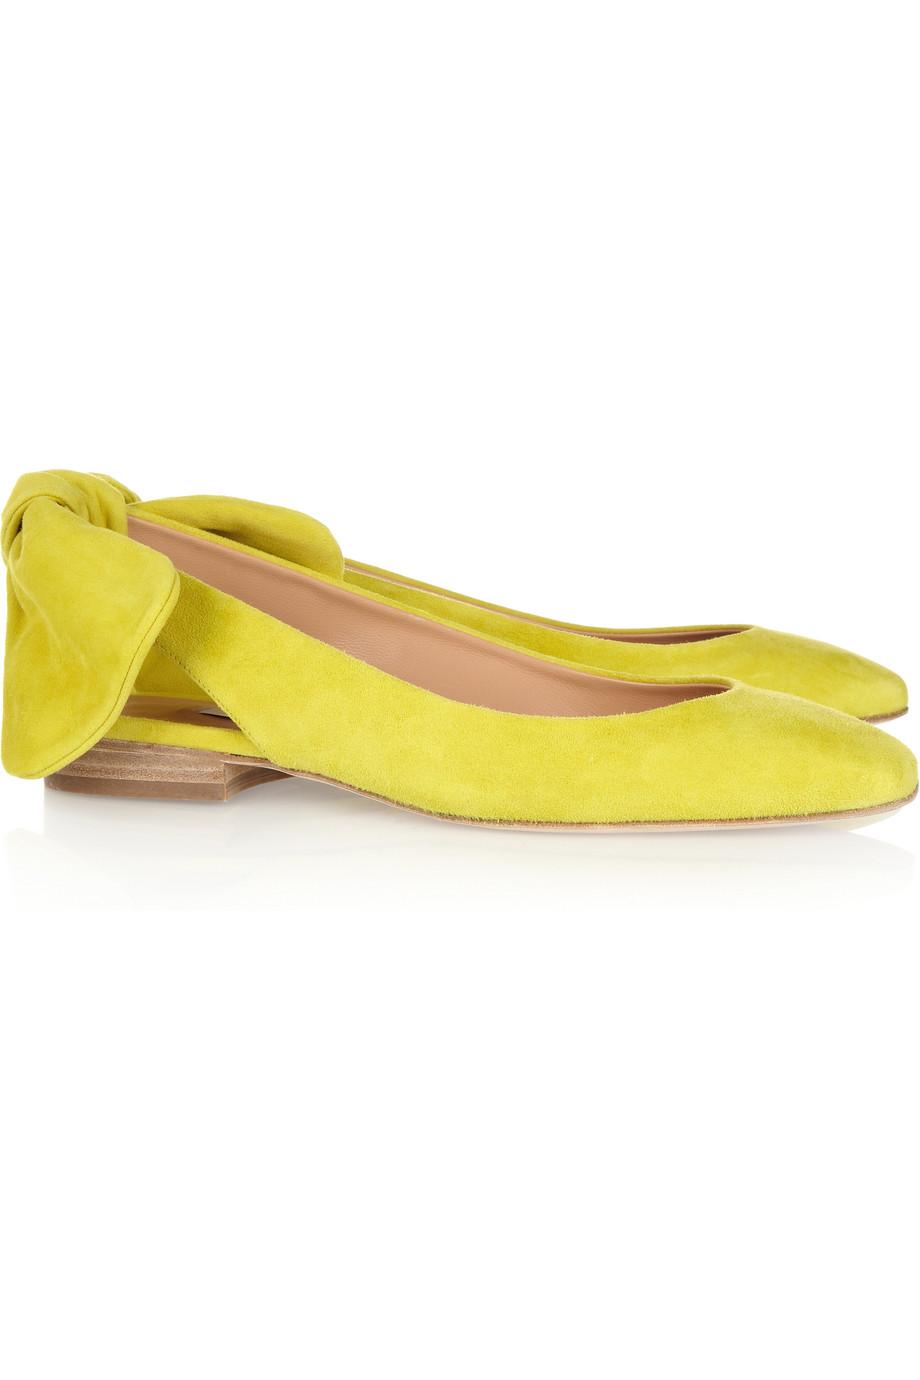 d07dd7135899 Lyst - Carven Flat Suede Slingbacks in Yellow